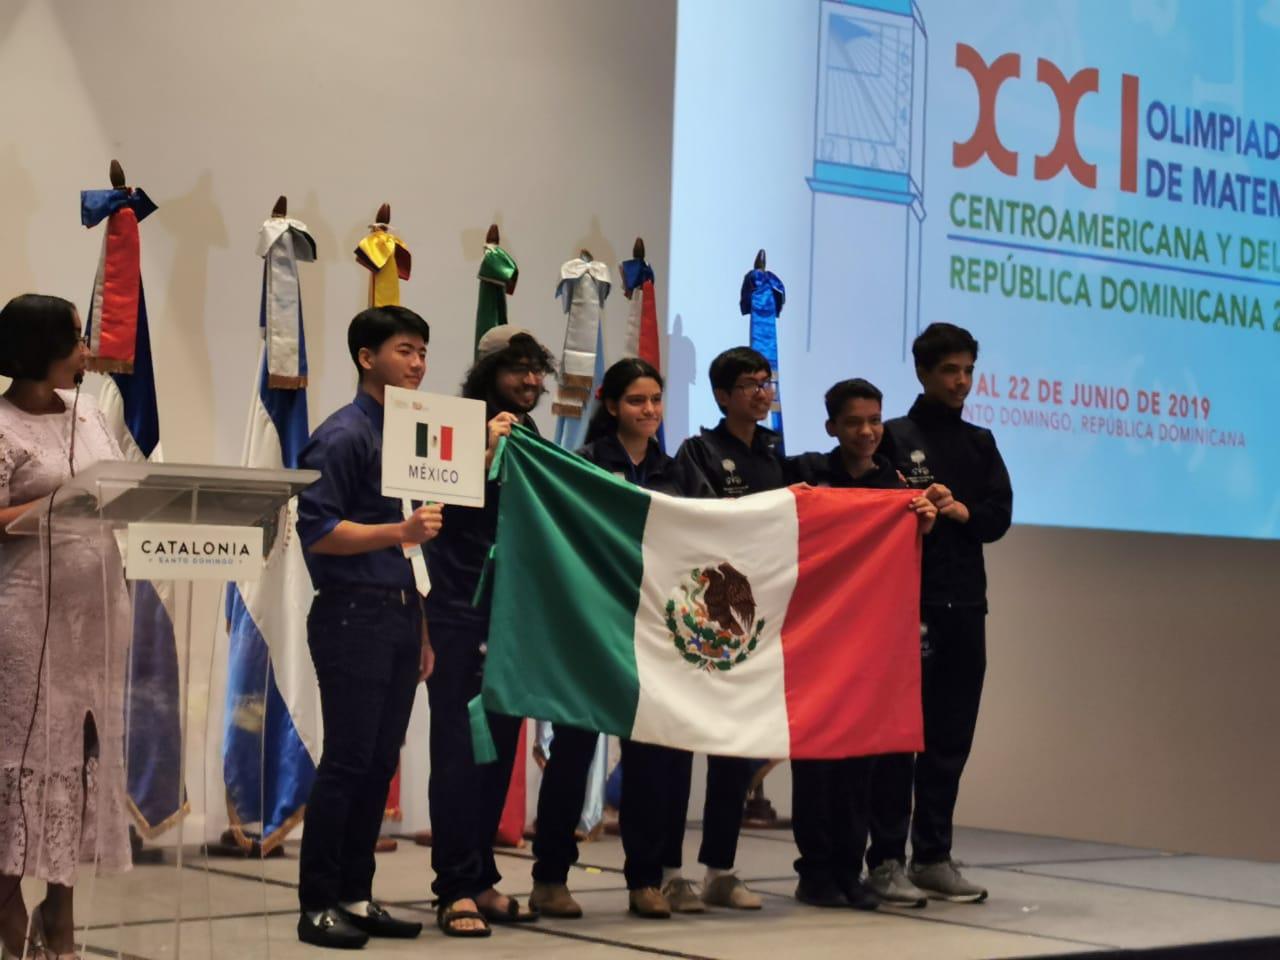 México-campeón9-olimpiada-centroamericana-matemática-UNAMGlobal